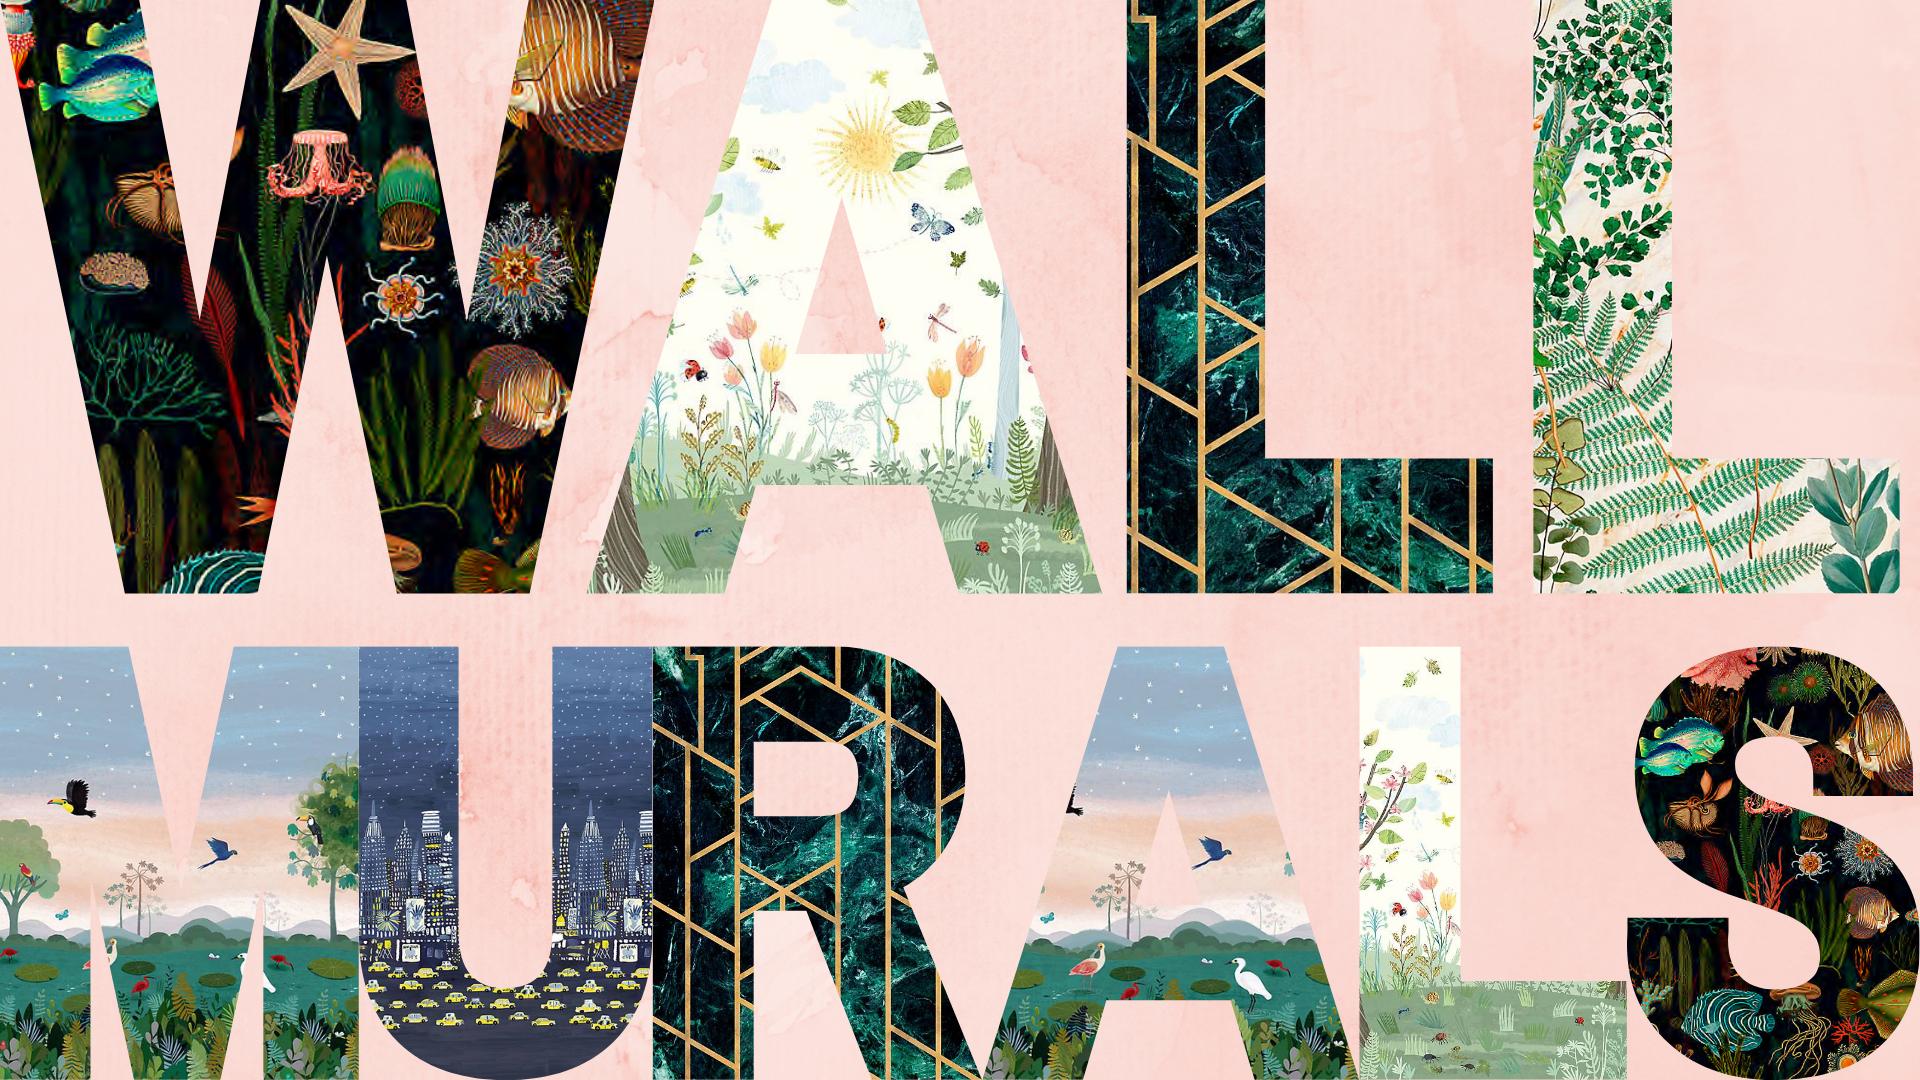 Landscape Wall Murals from John Lewis